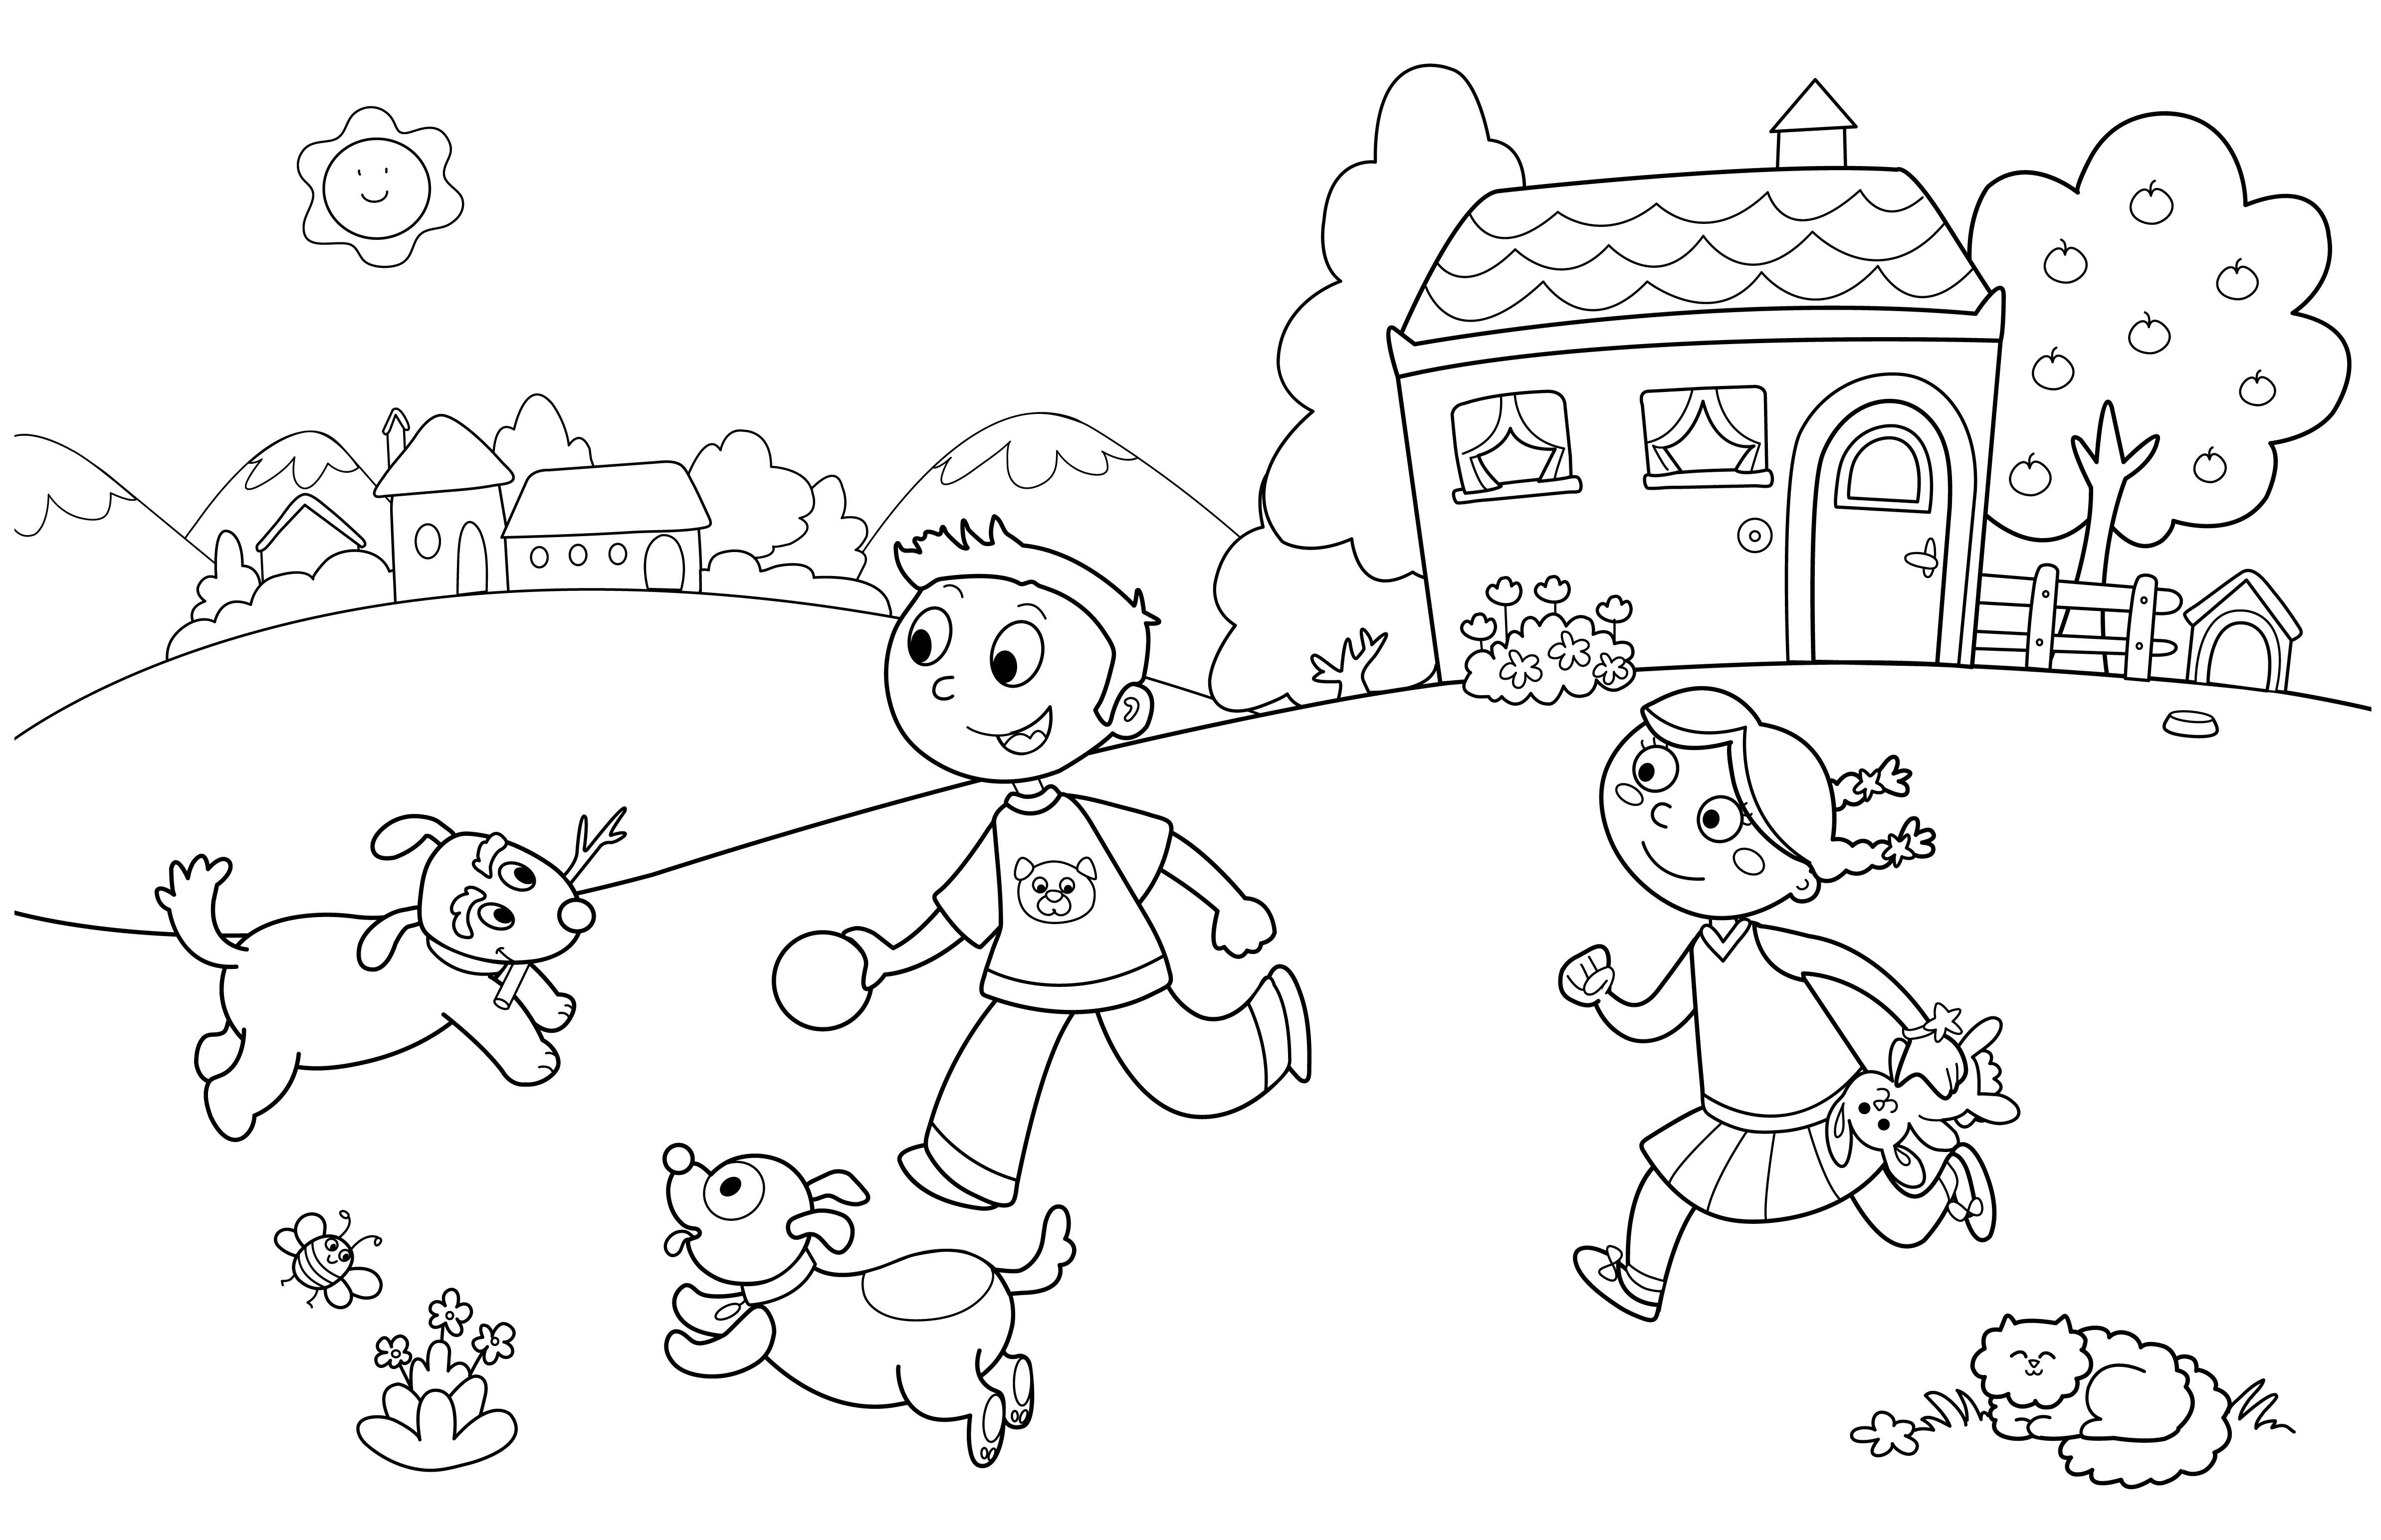 Kindergarten Free Coloring Sheets  Preschool Summer Coloring Pages Bestofcoloring